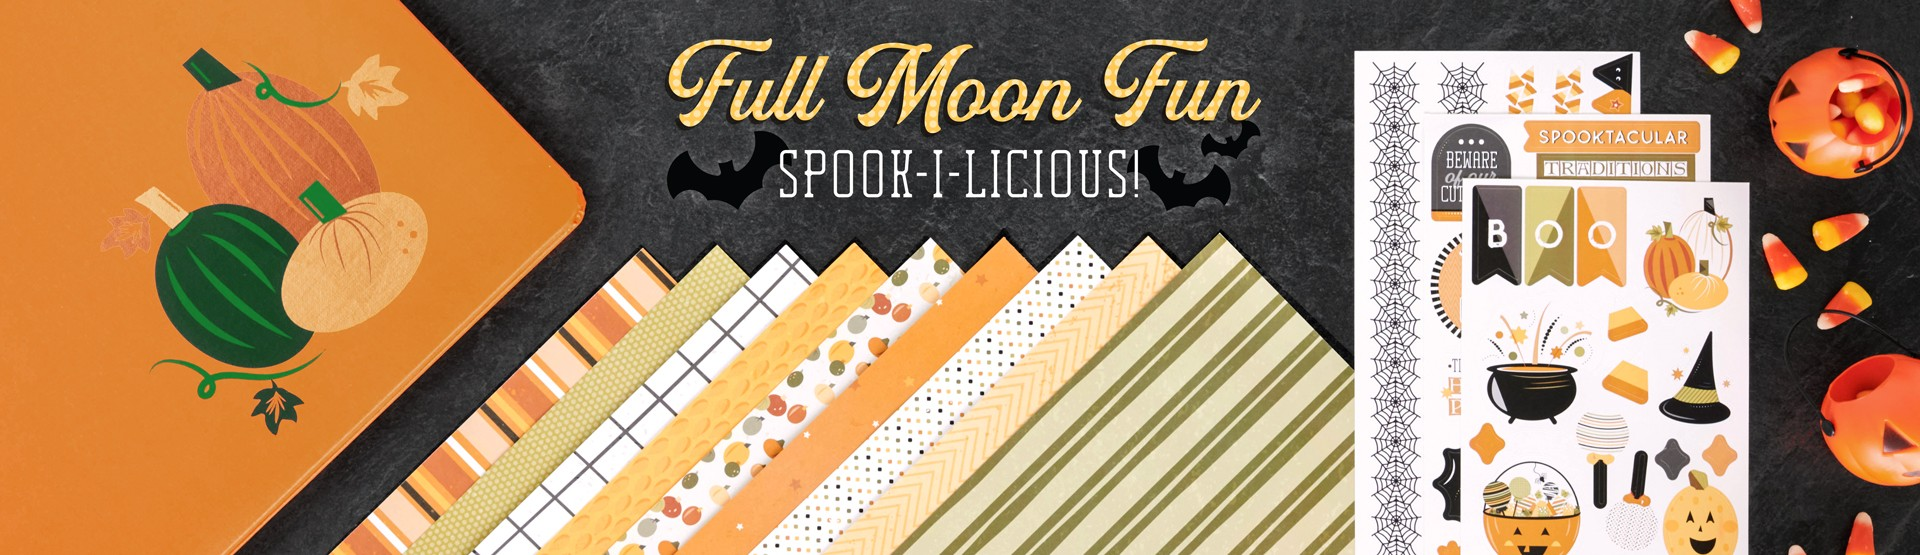 Halloween Scrapbooking Supplies: Full Moon Fun